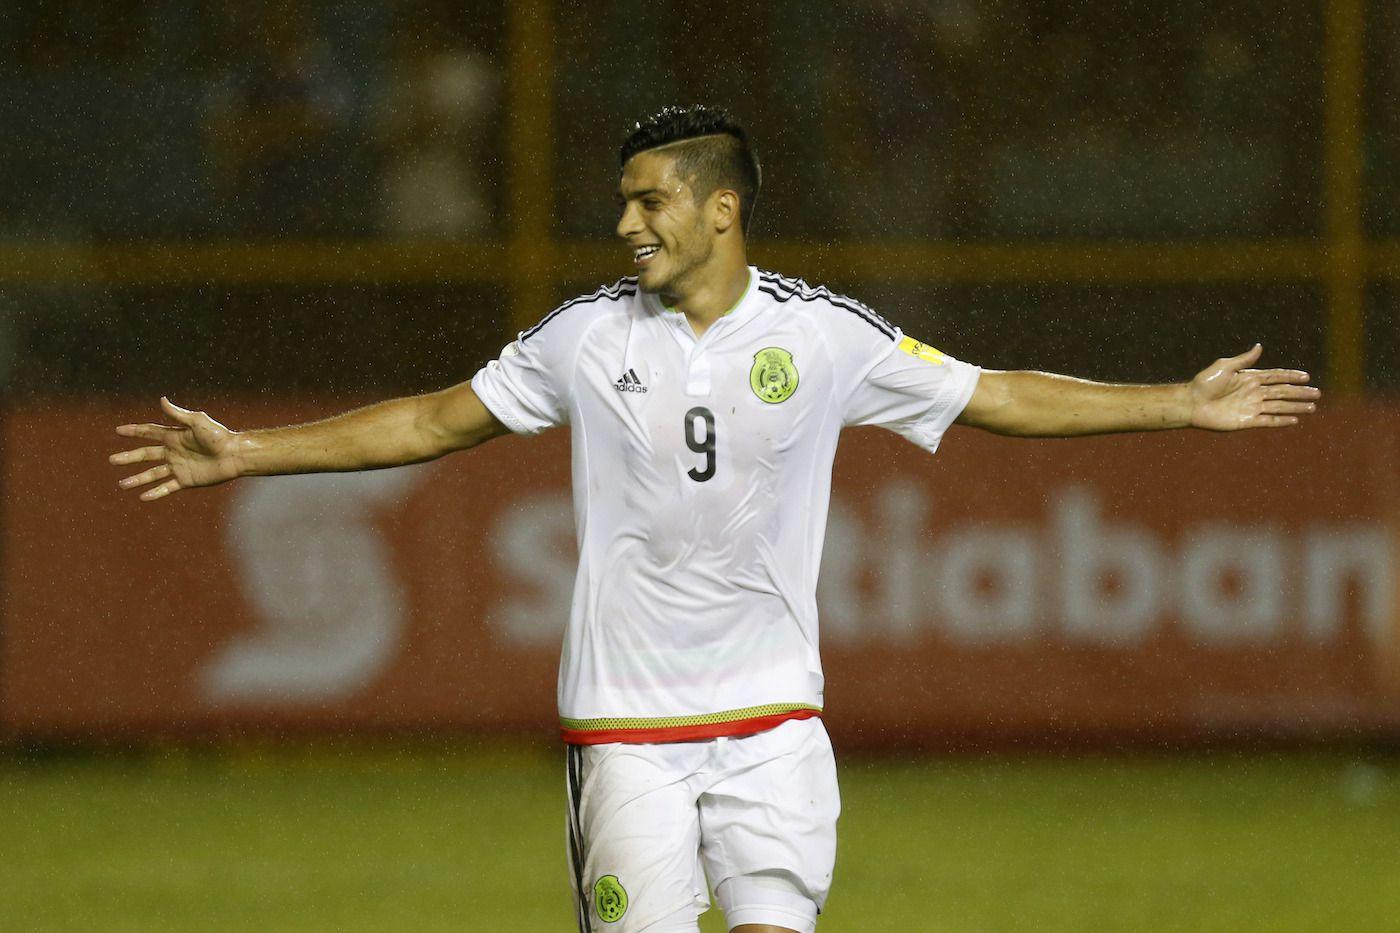 Raúl Jiménez celebra luego de anotar un gol de México an el partido ante El Salvador, en eliminatorias mundialistas. AP